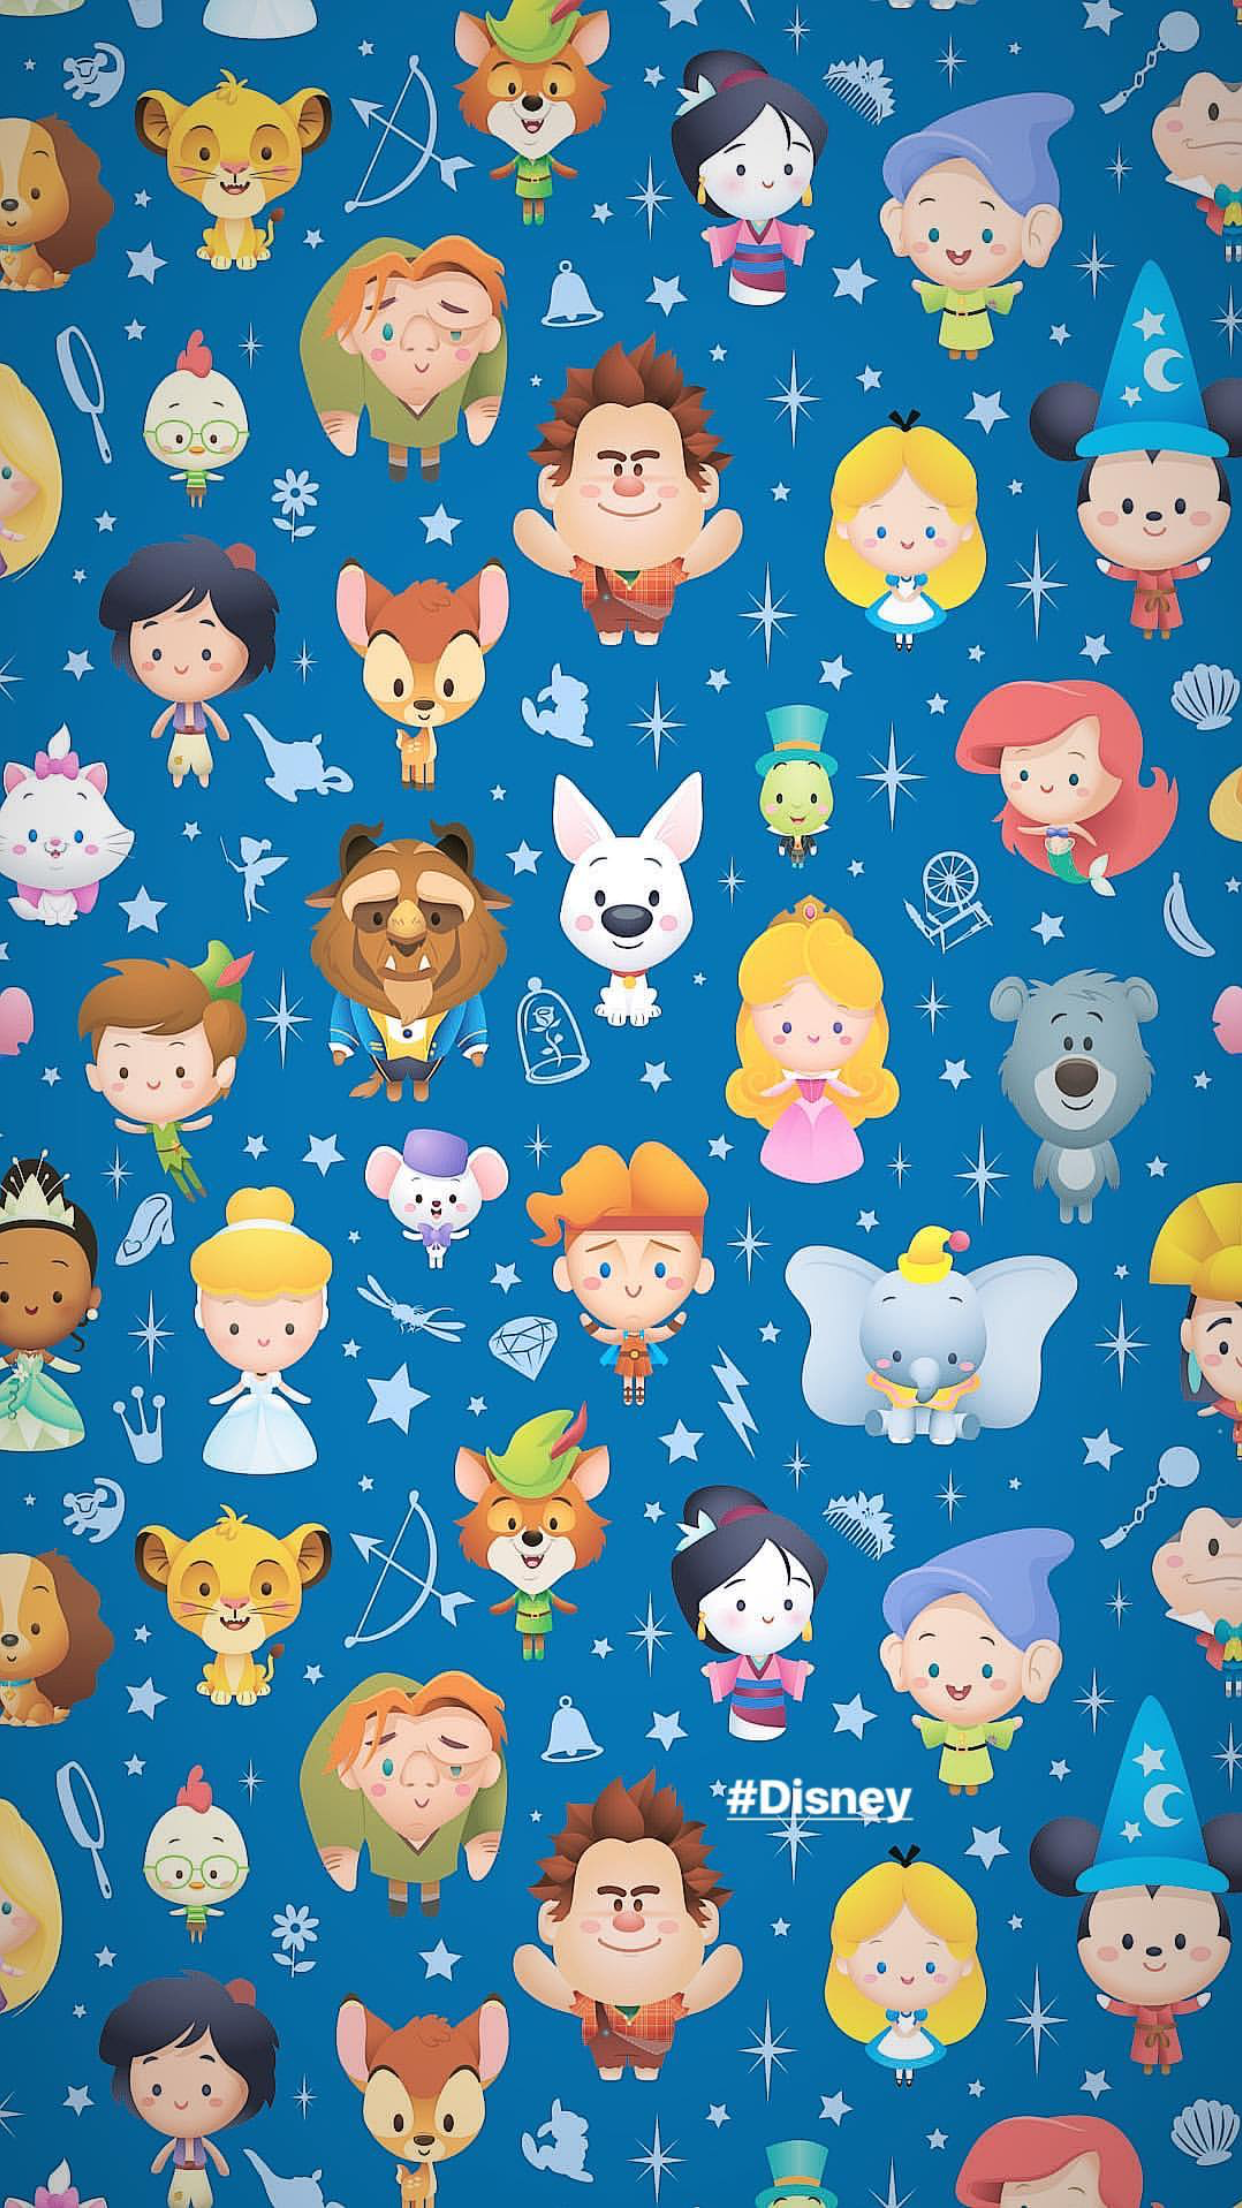 Disney characters by artist Jarrod Maruyama lock screen